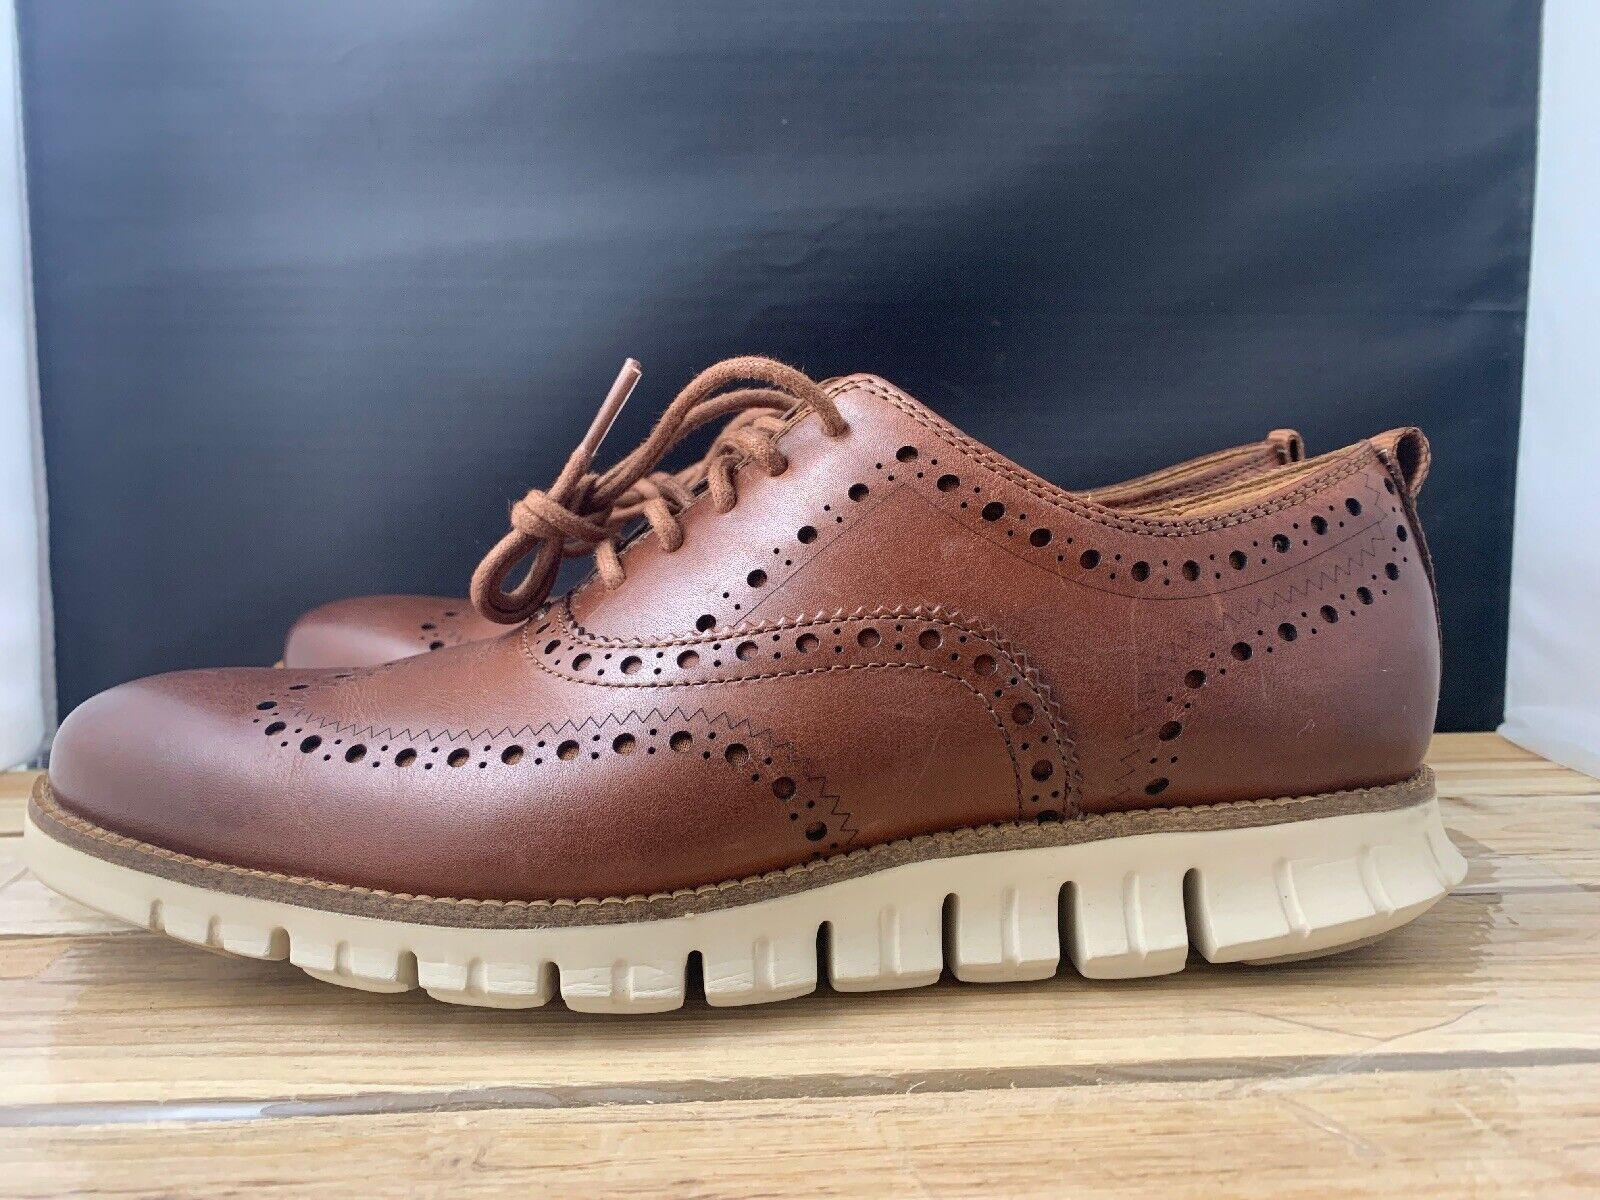 Cole Haan ZEROGRAND Wingtip Oxford Ivory Tan Brown Dress shoes C23741 SZ 8.5